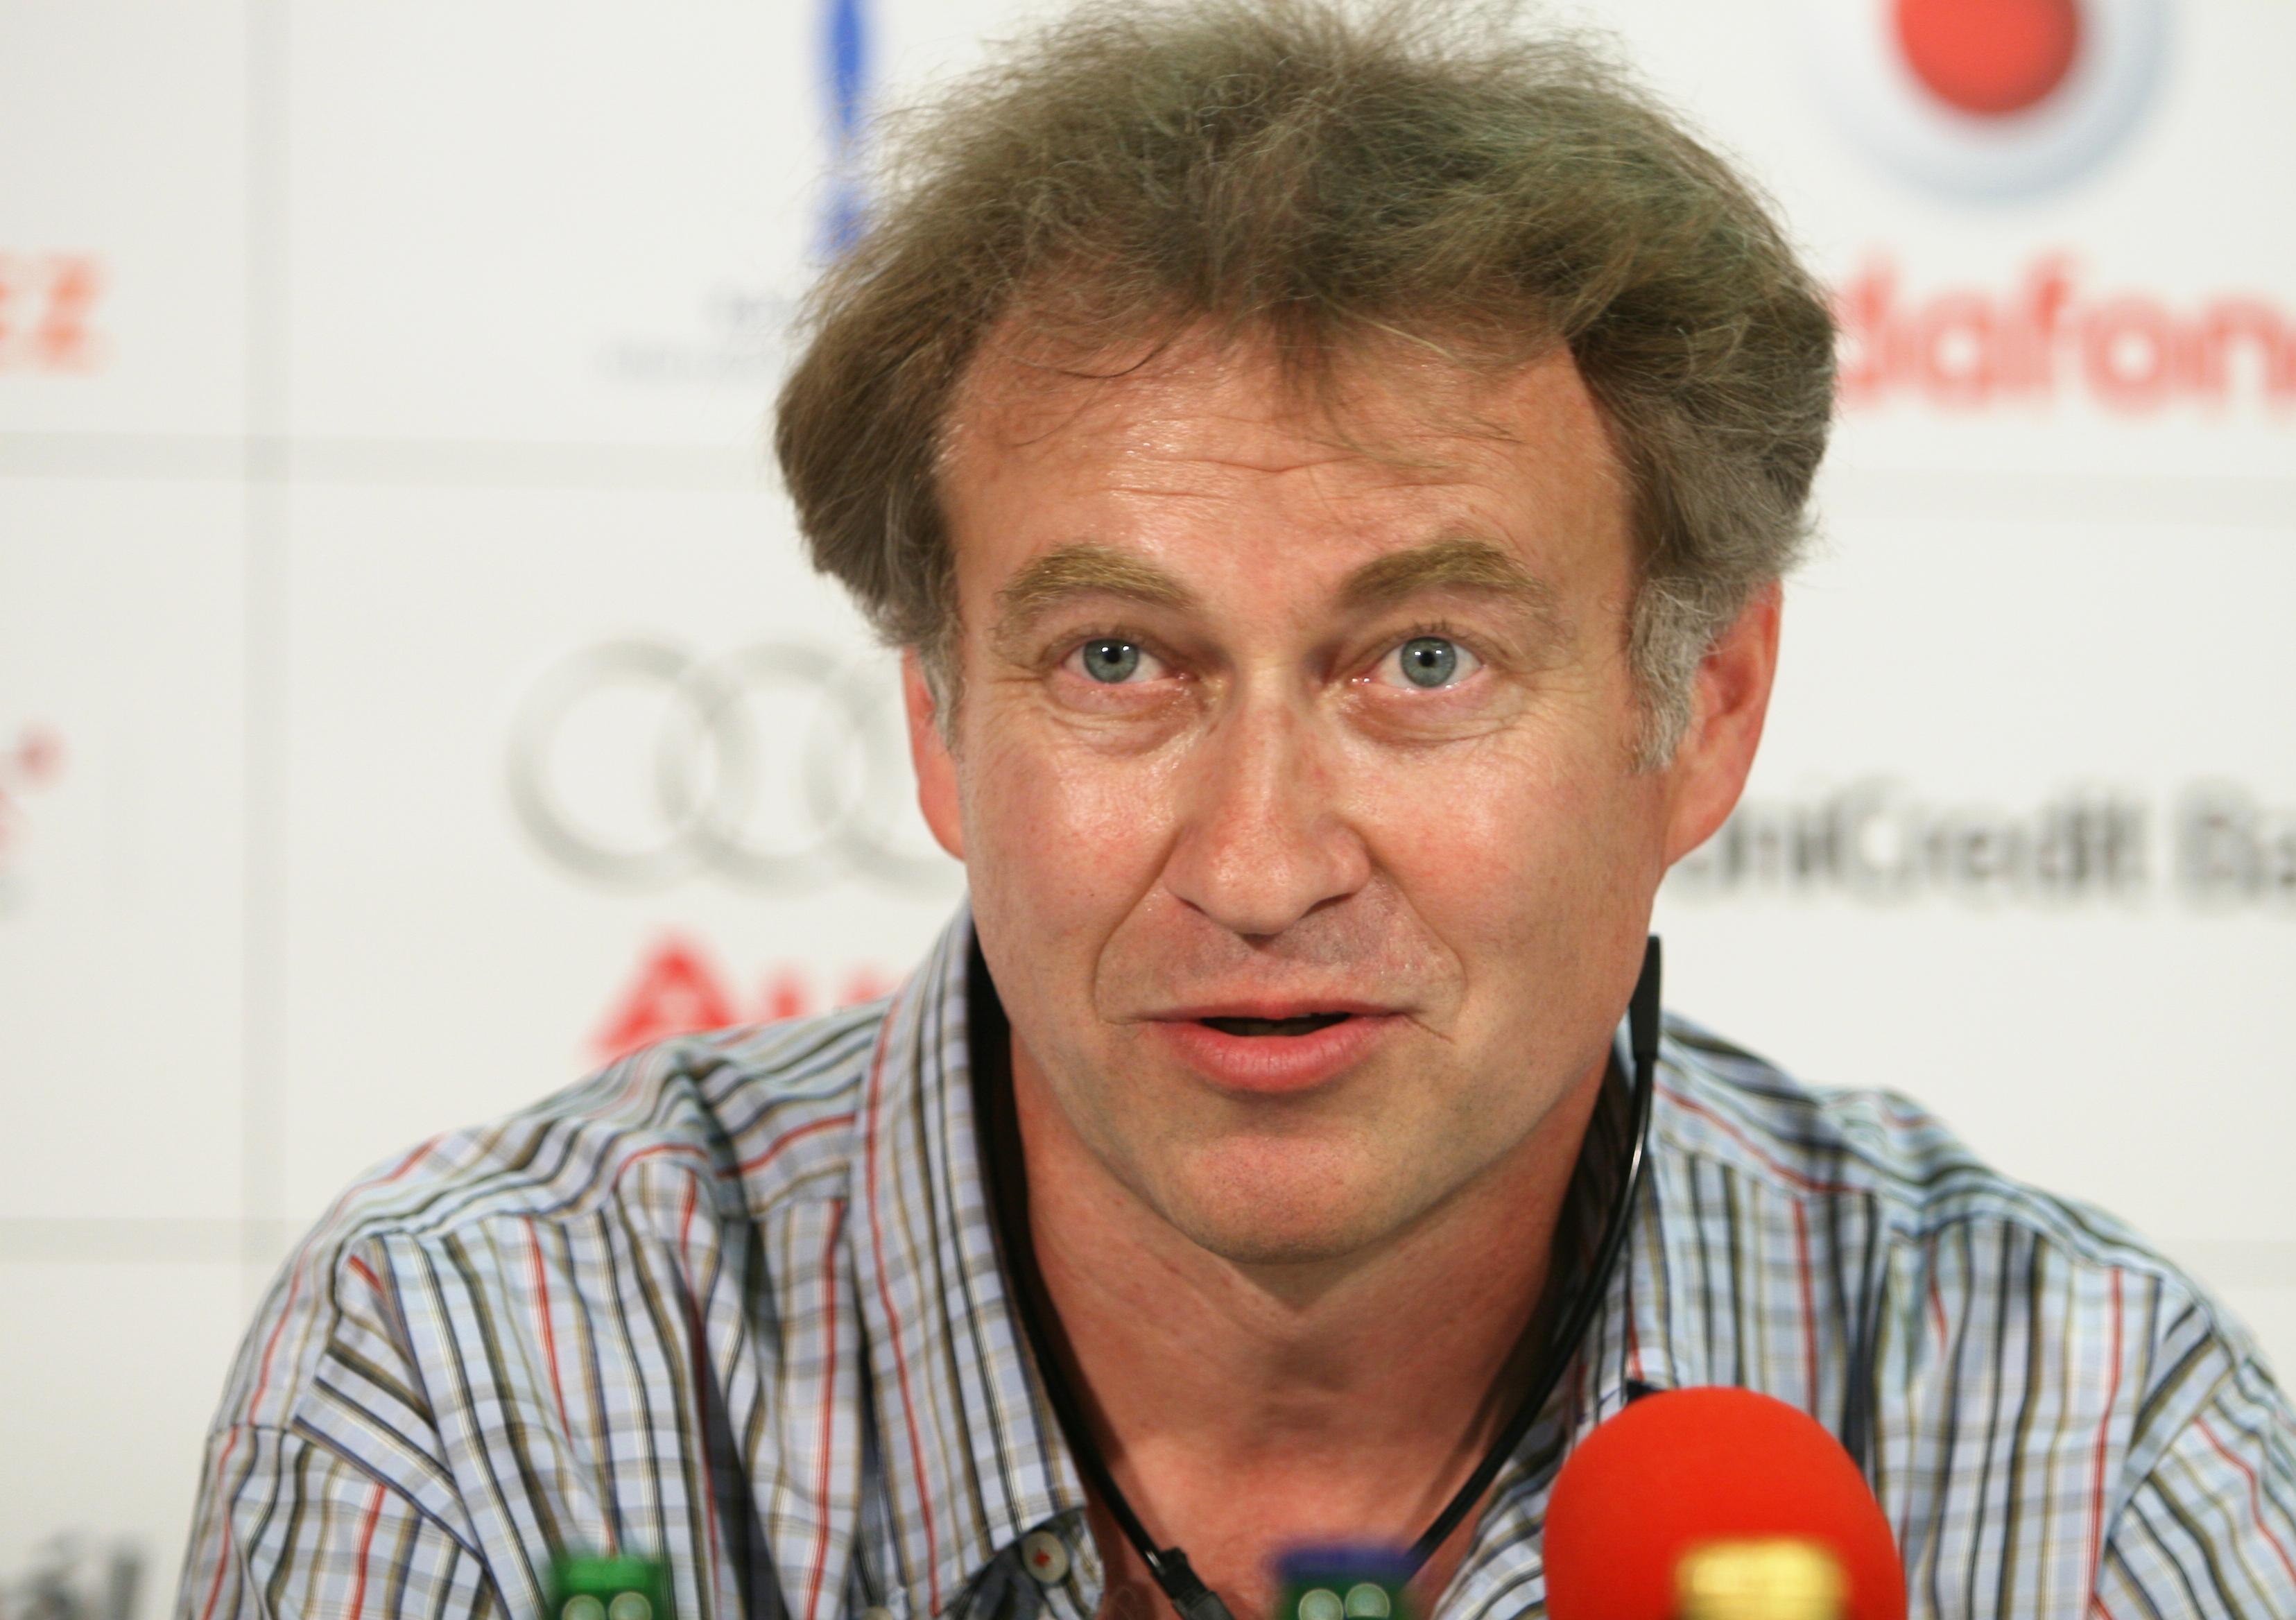 Zrinko Ogresta